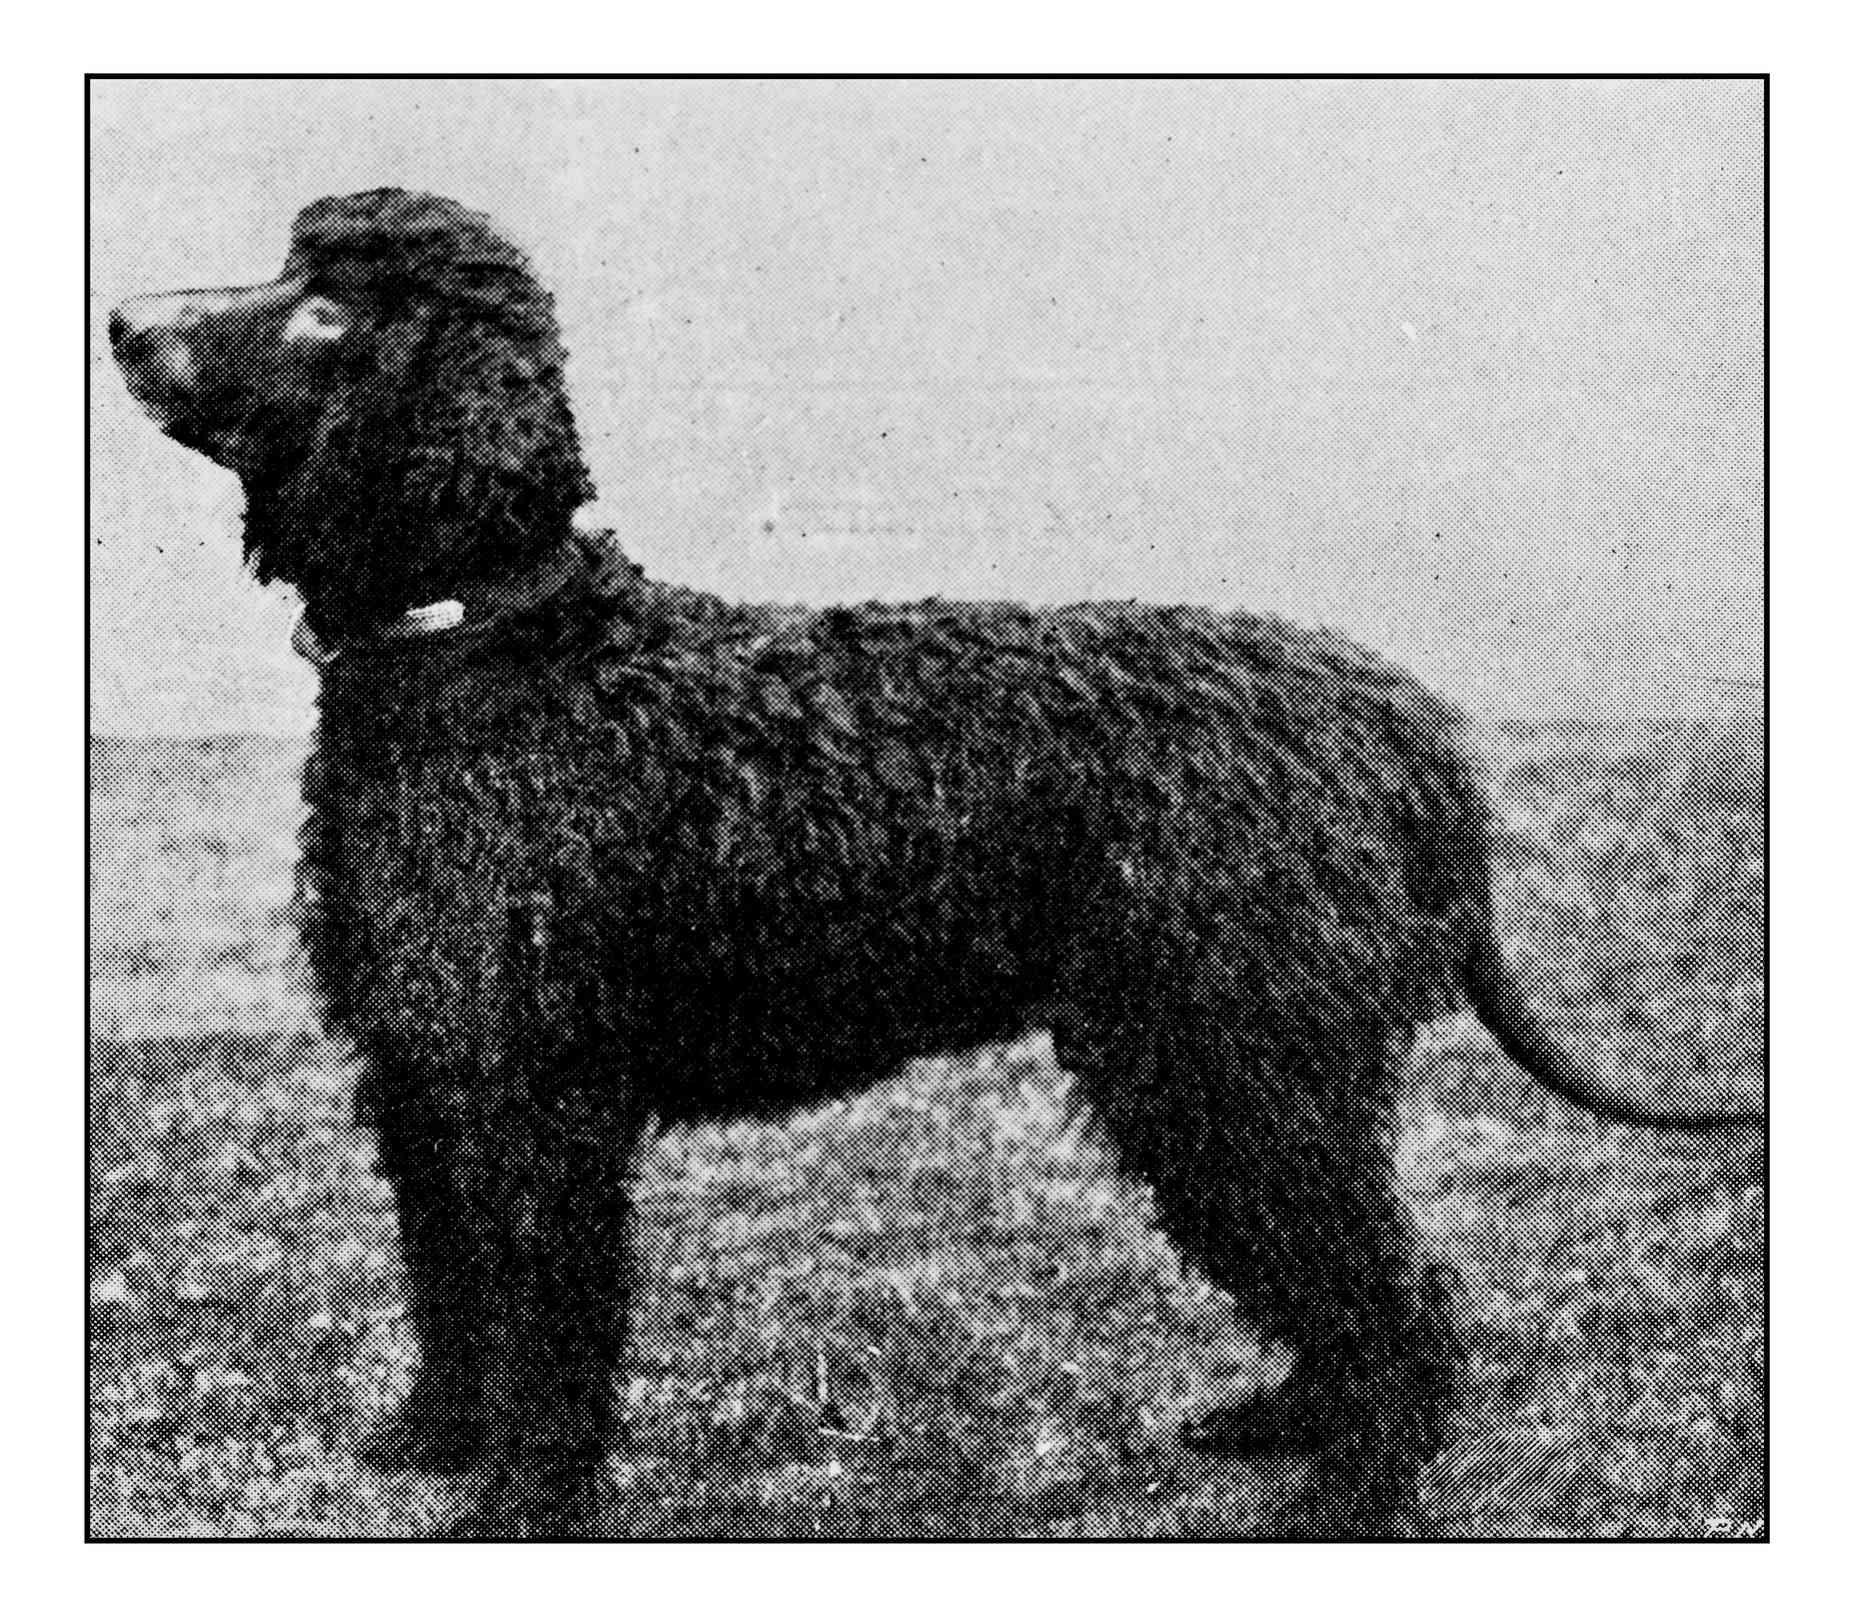 Antique dotprinted photograph of dog: Irish water spaniel